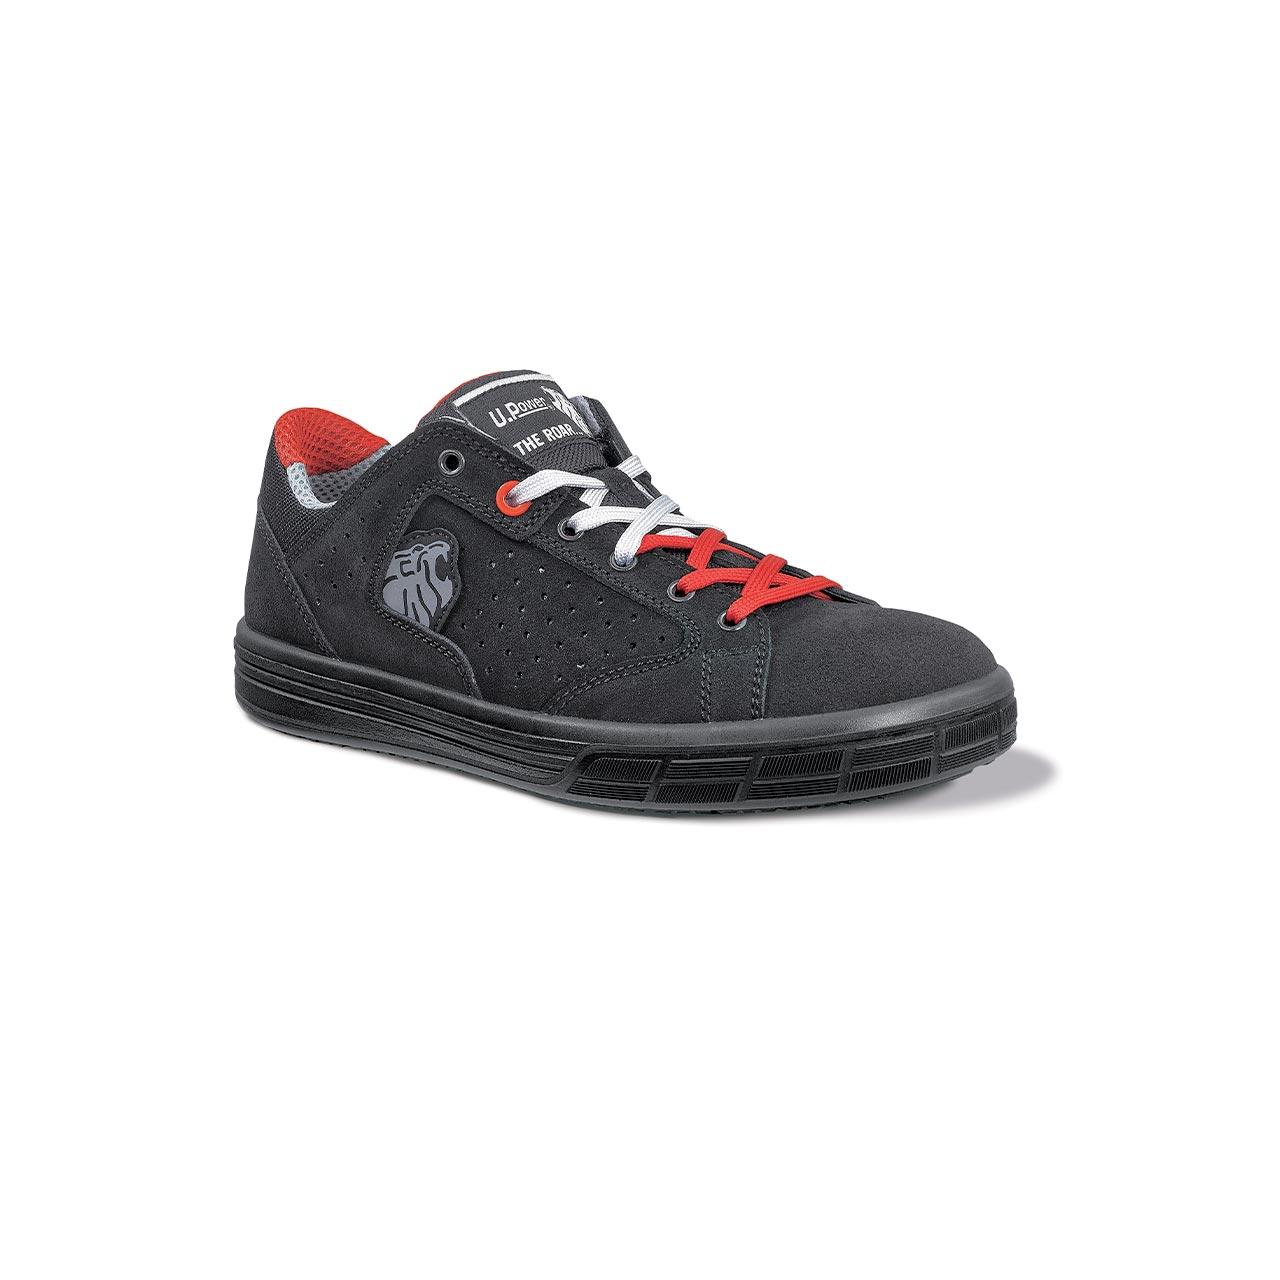 scarpa antinfortunistica upower modello joy linea theroar vista laterale